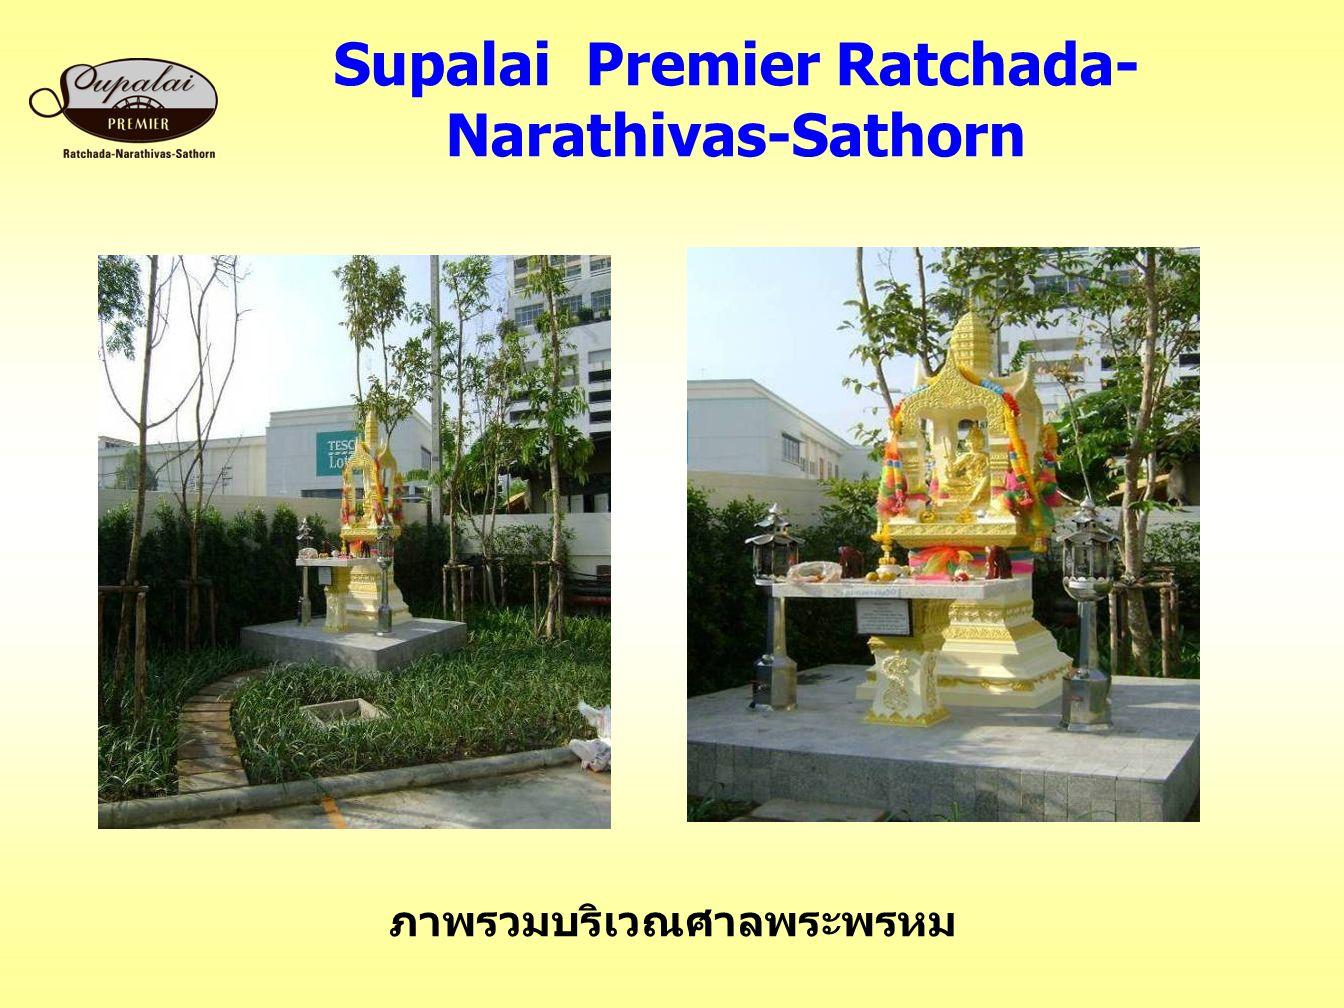 Supalai Premier Ratchada- Narathivas-Sathorn ภาพรวมบริเวณศาลพระพรหม